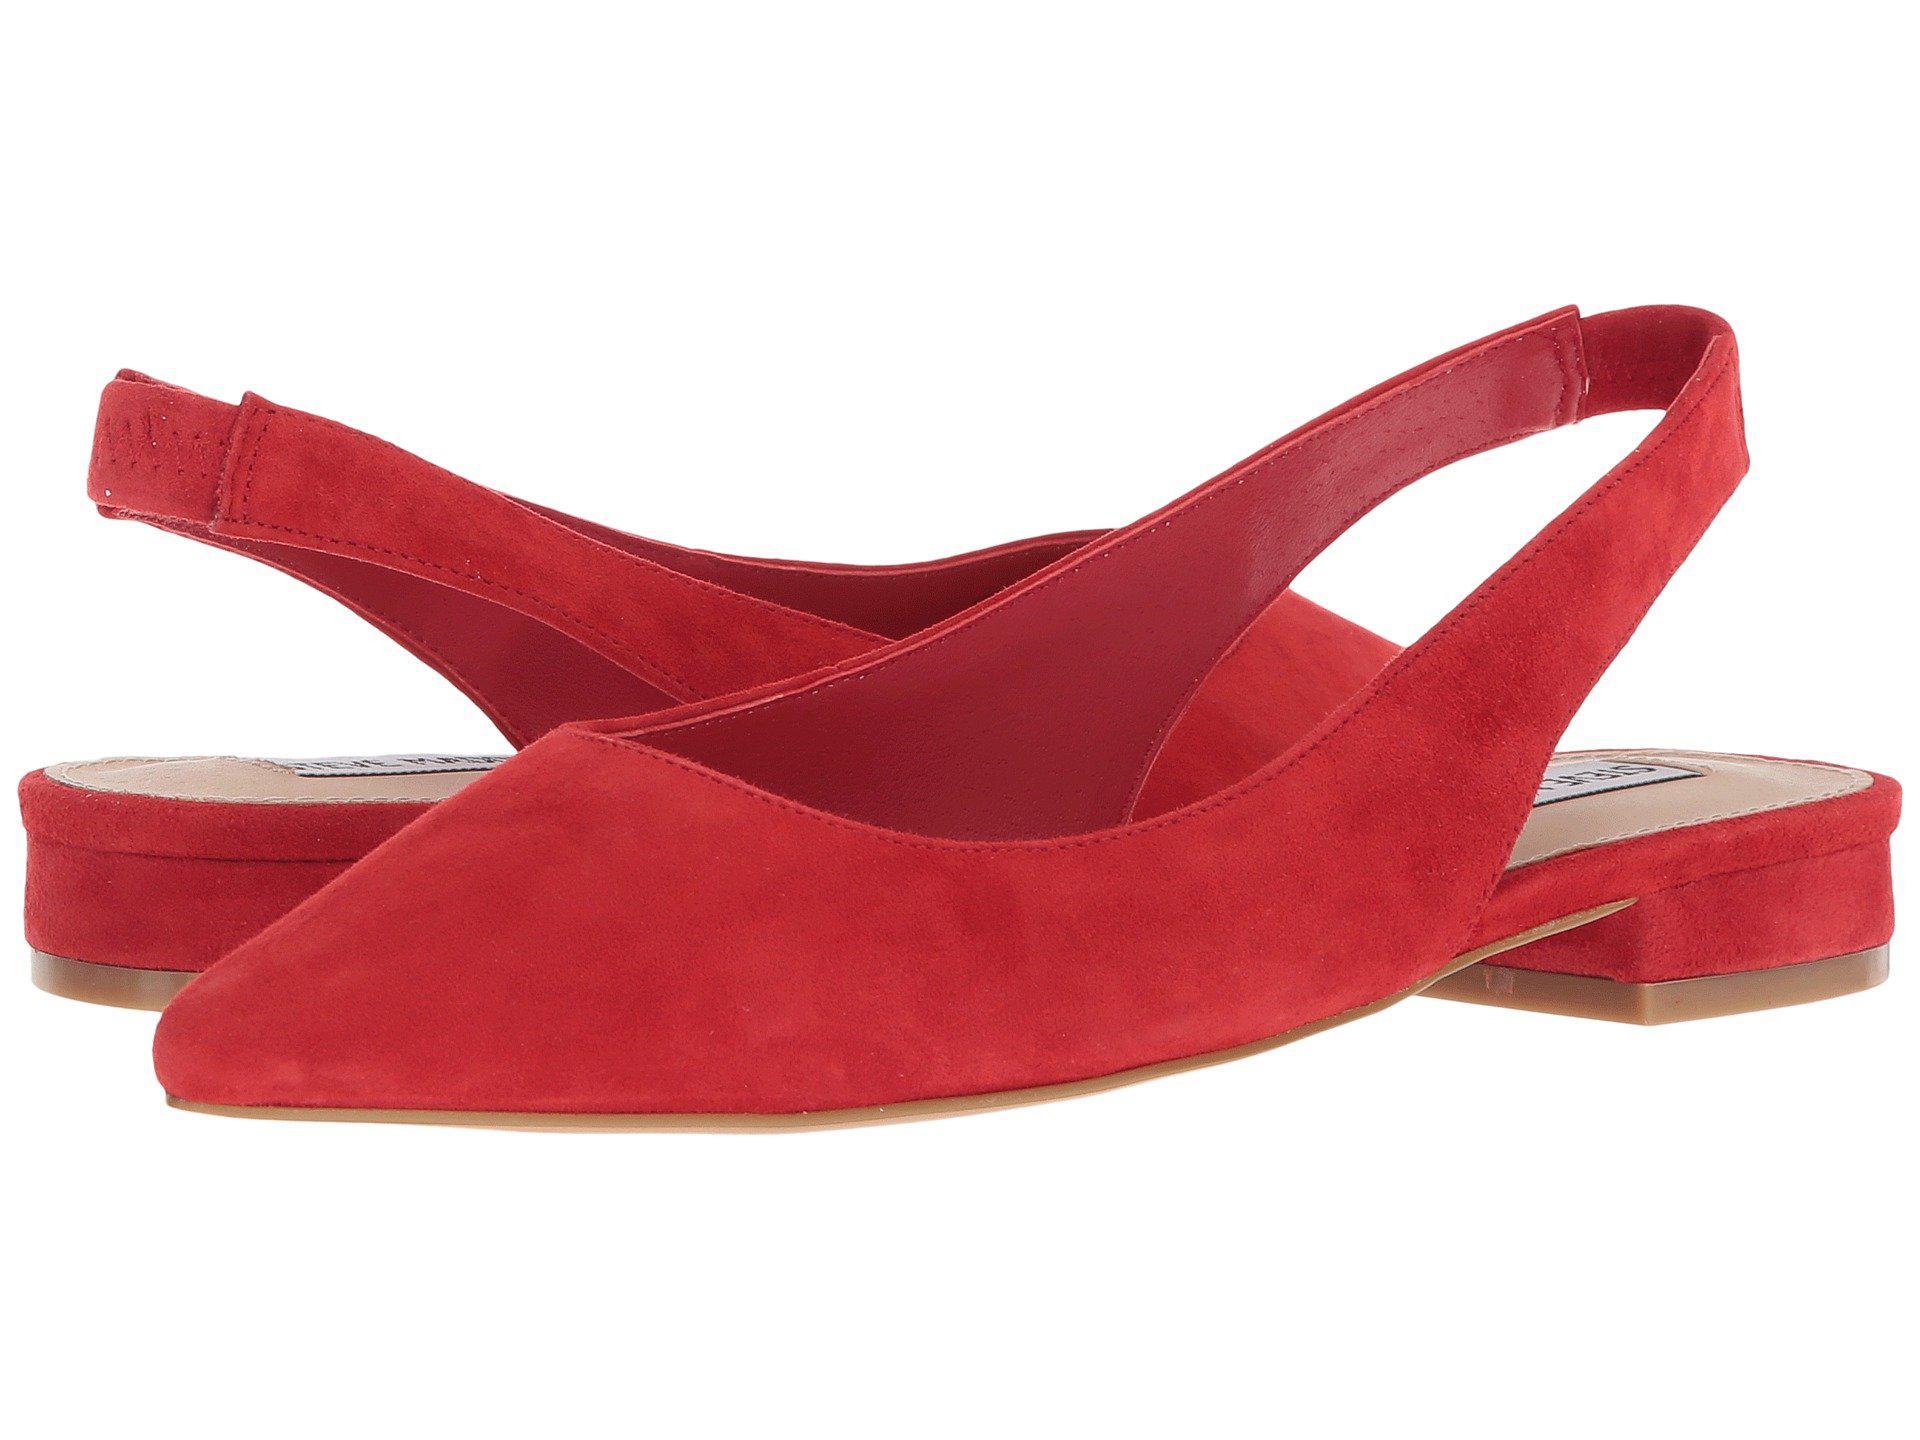 a279f5763c7 Women's Red Envi Slingback Flat